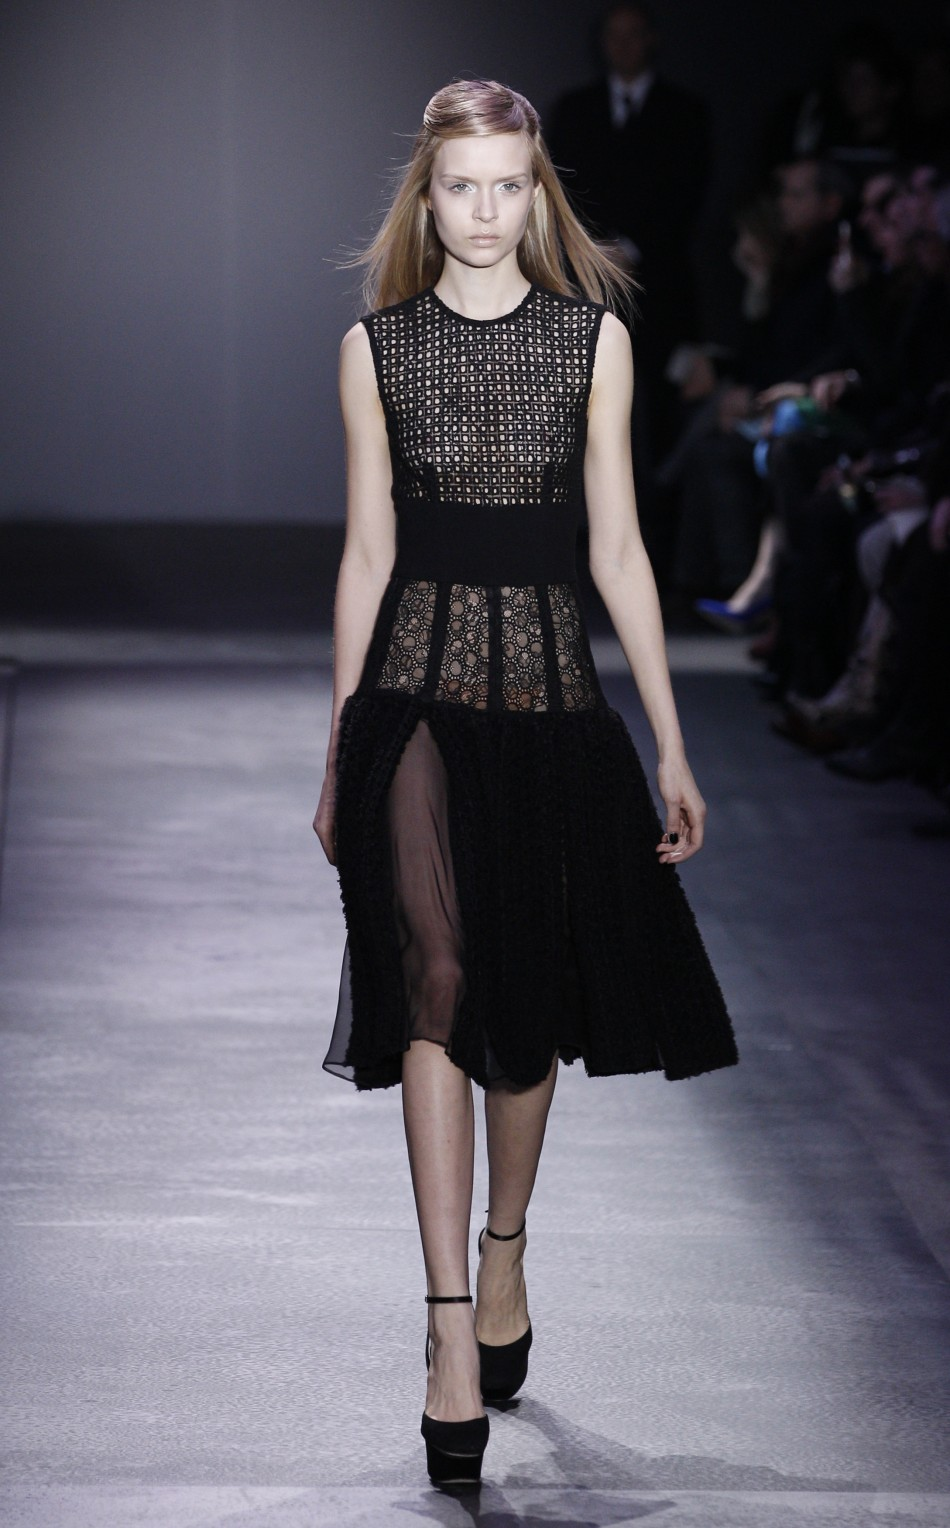 Giambattista Valli 39 S Sophisticated Daywear Collection For Paris Fashion Week Photos